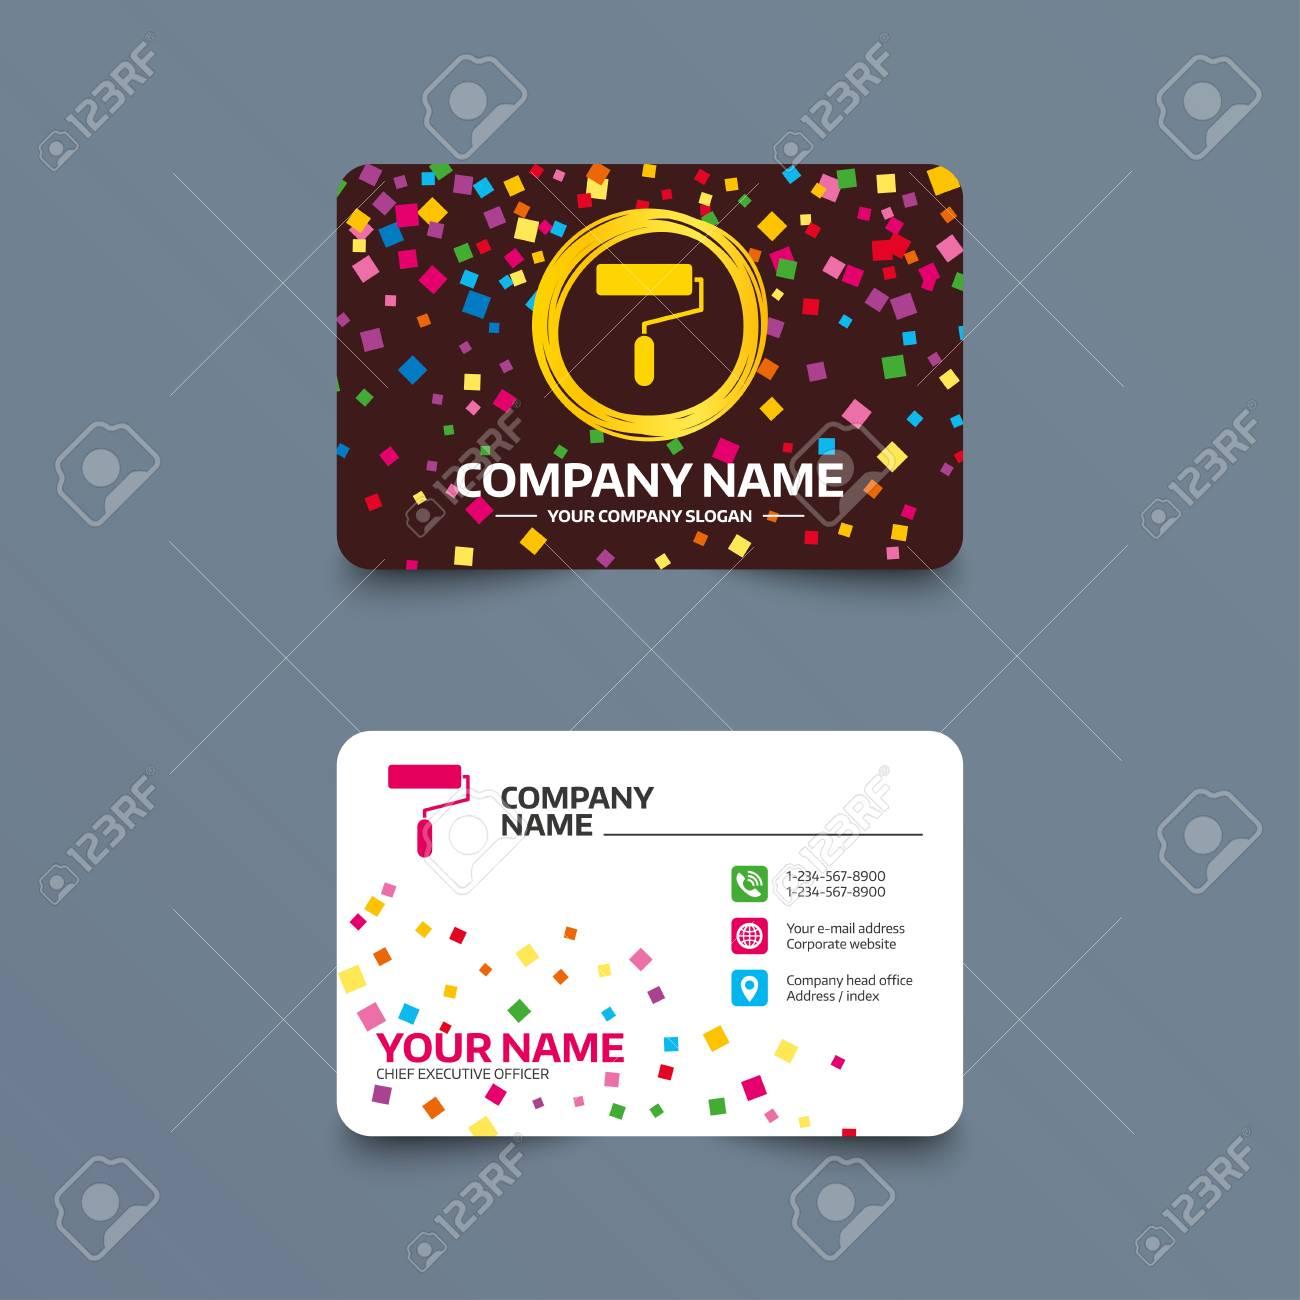 Business card template with confetti pieces paint roller sign business card template with confetti pieces paint roller sign icon painting tool symbol colourmoves